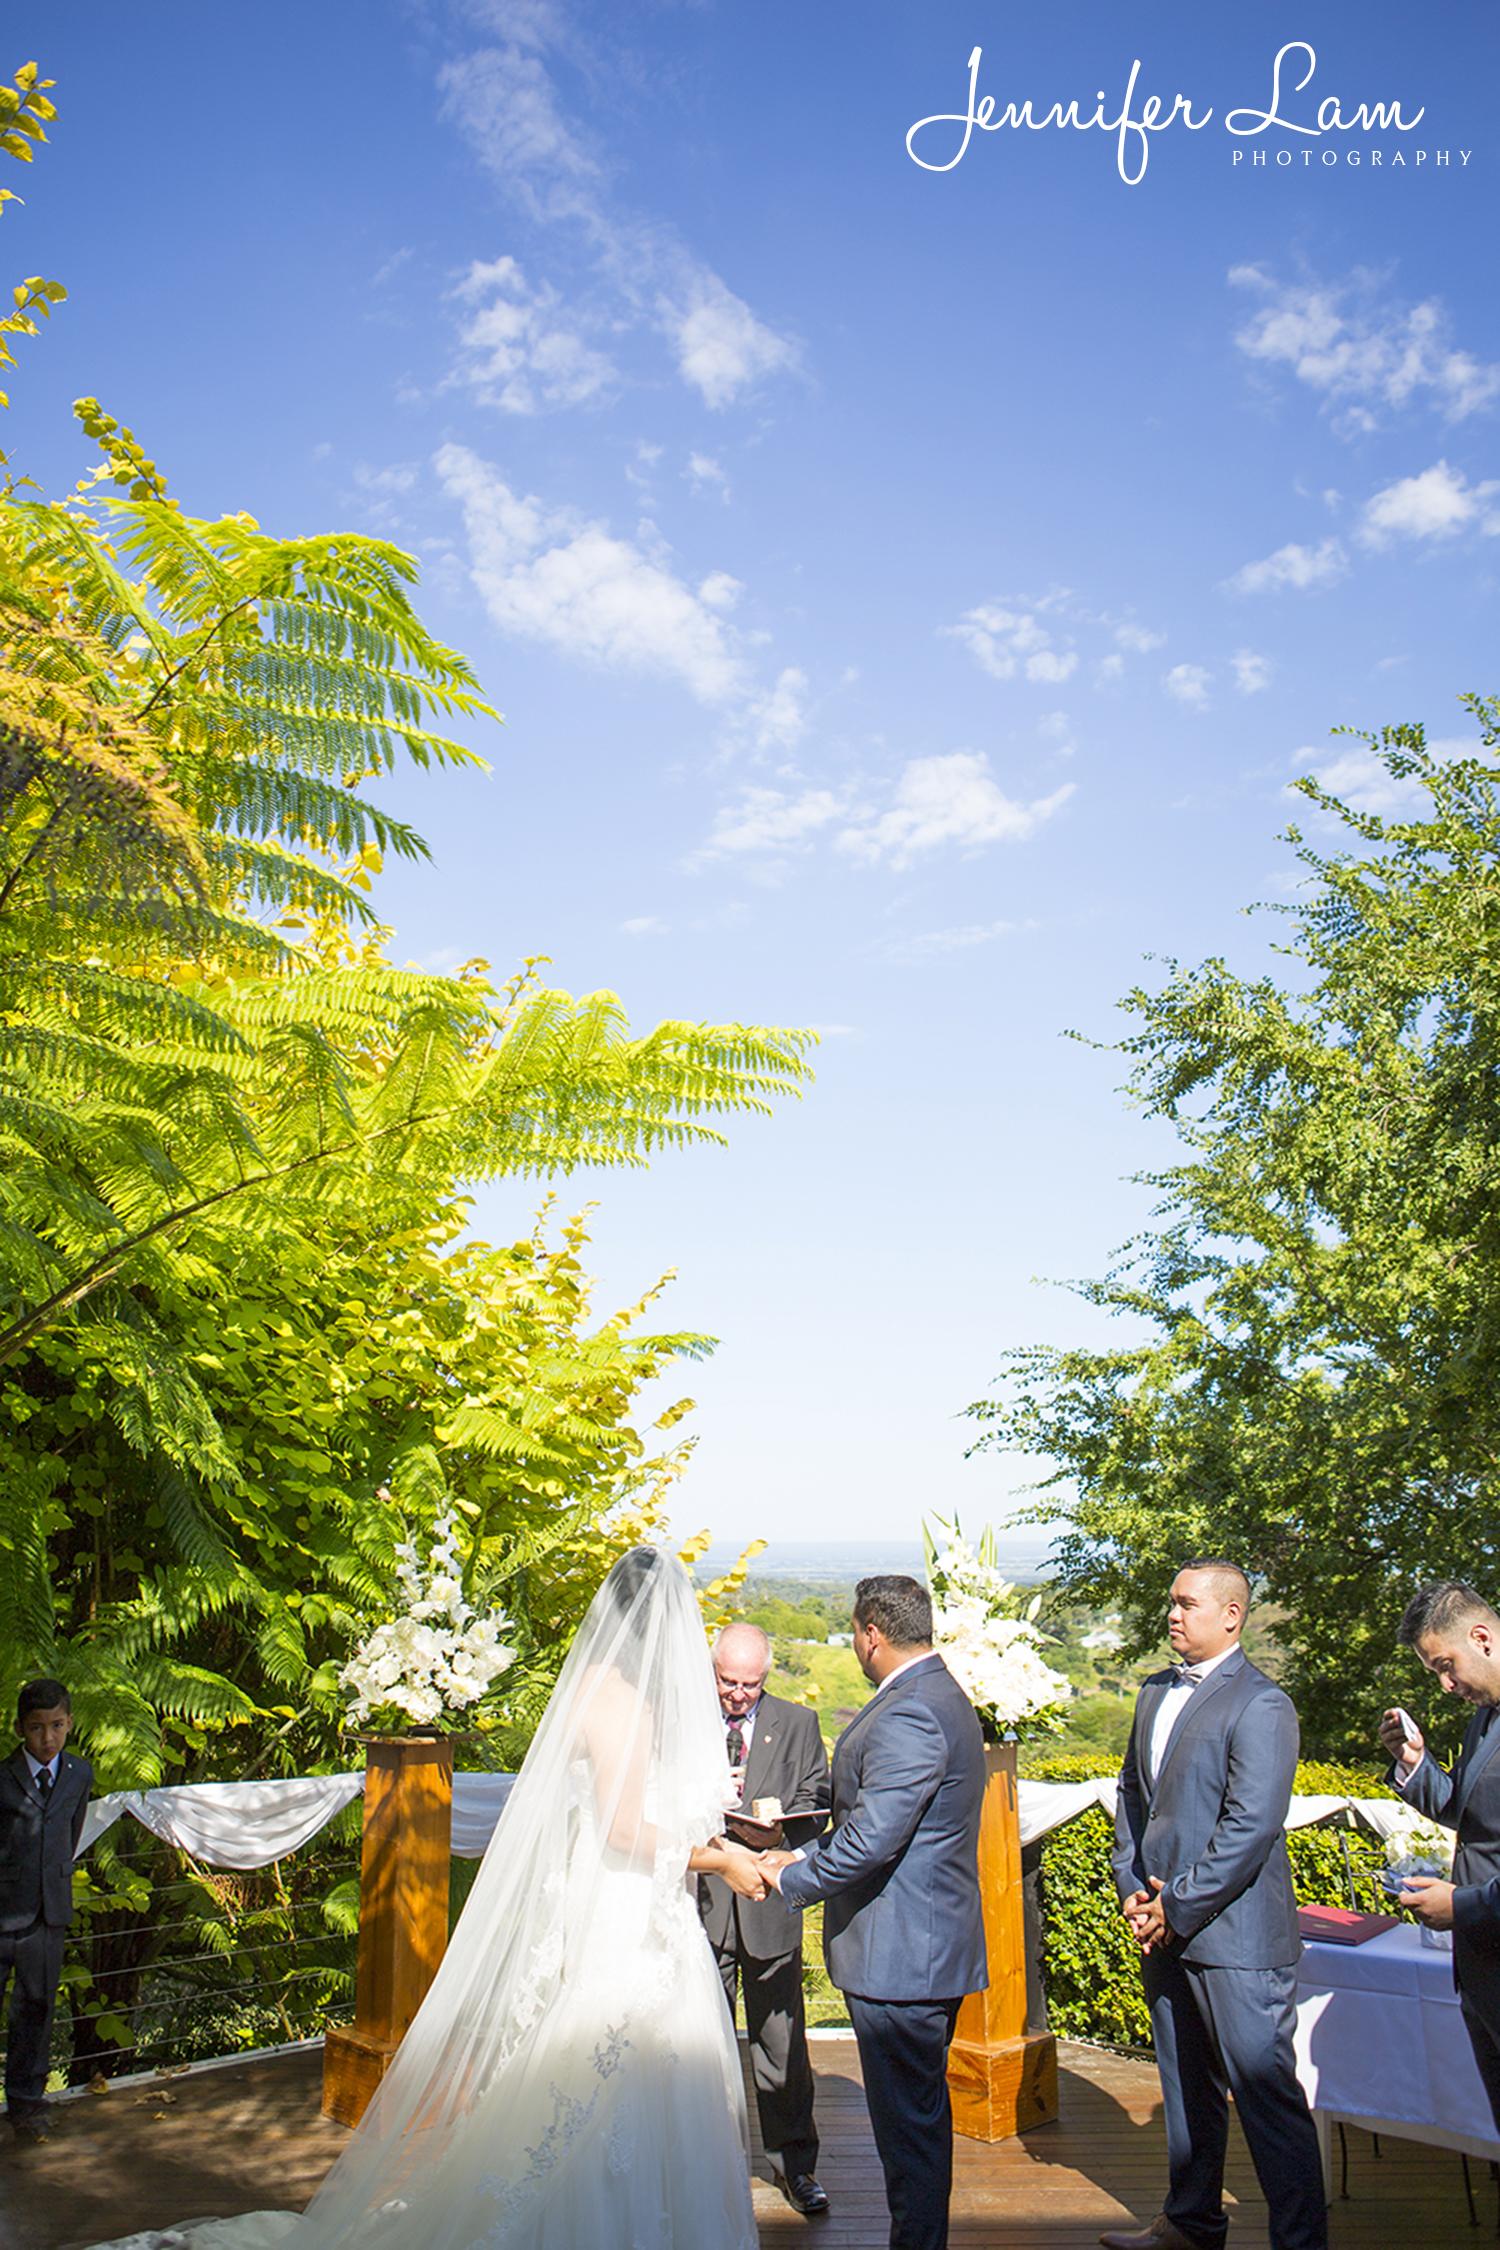 Sydney Wedding Photographer - Jennifer Lam Photography - www.jenniferlamphotography (30).jpg